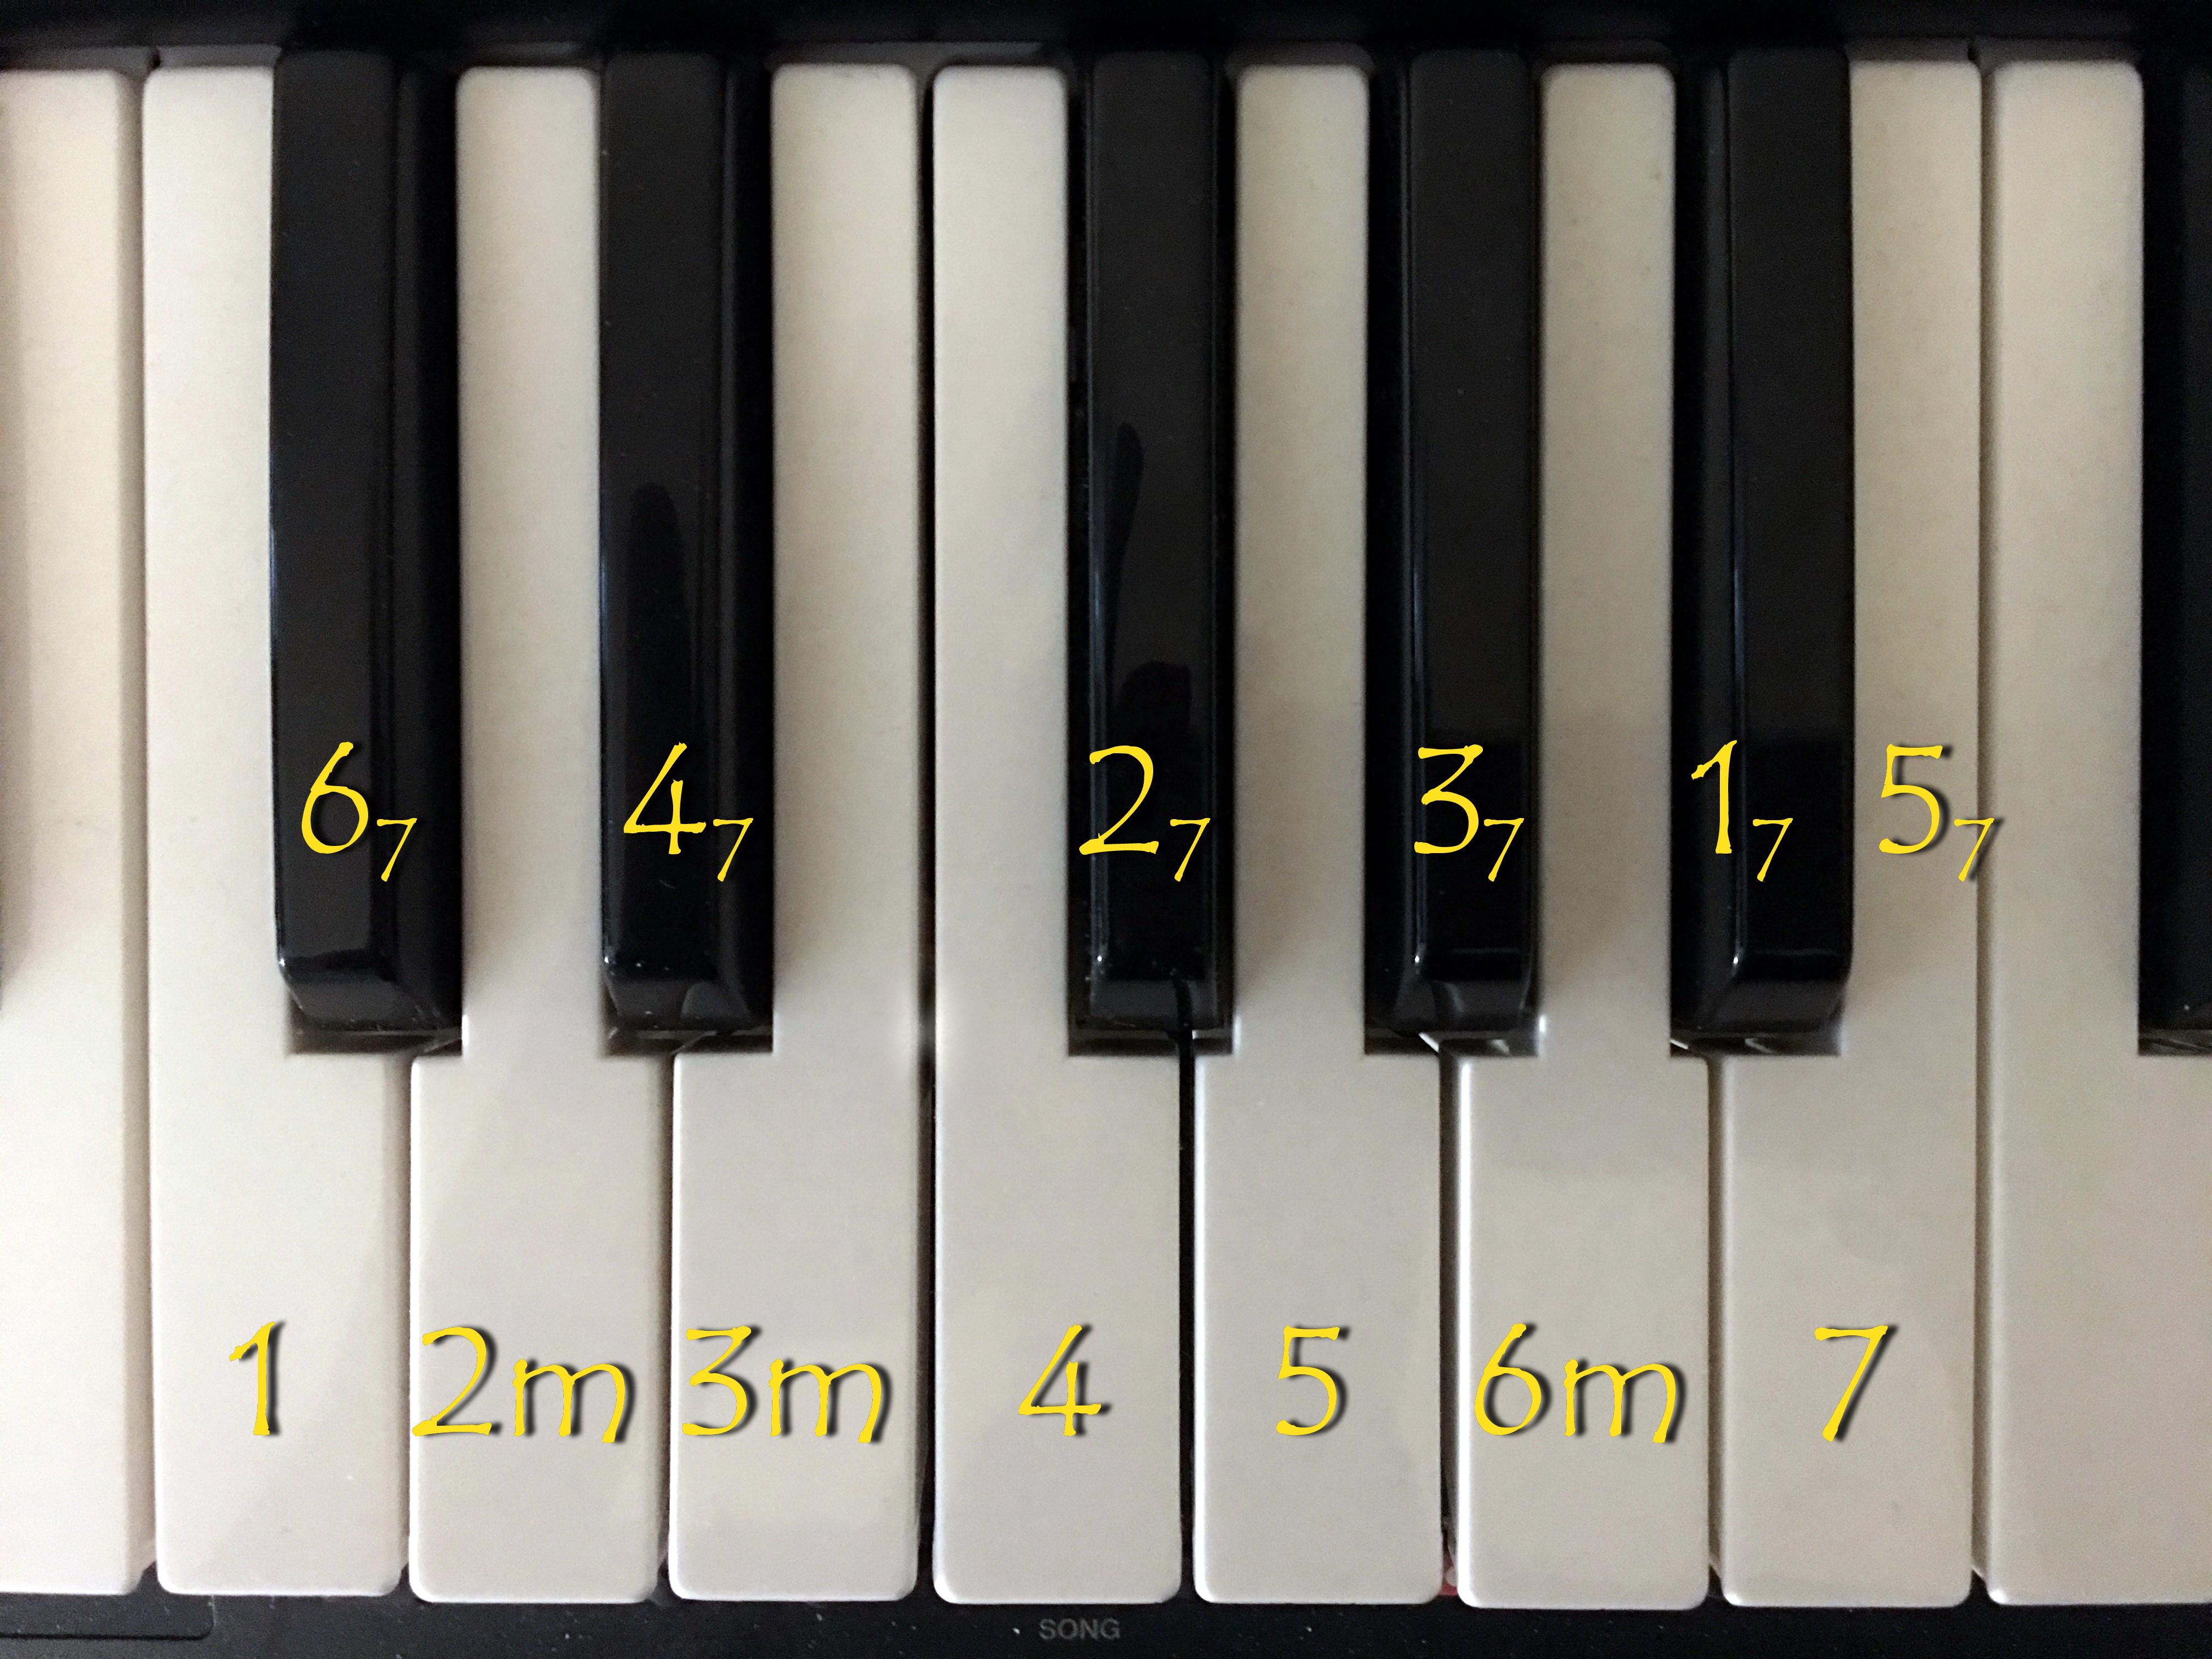 http://music.tunghai74.org/images/chords.jpg